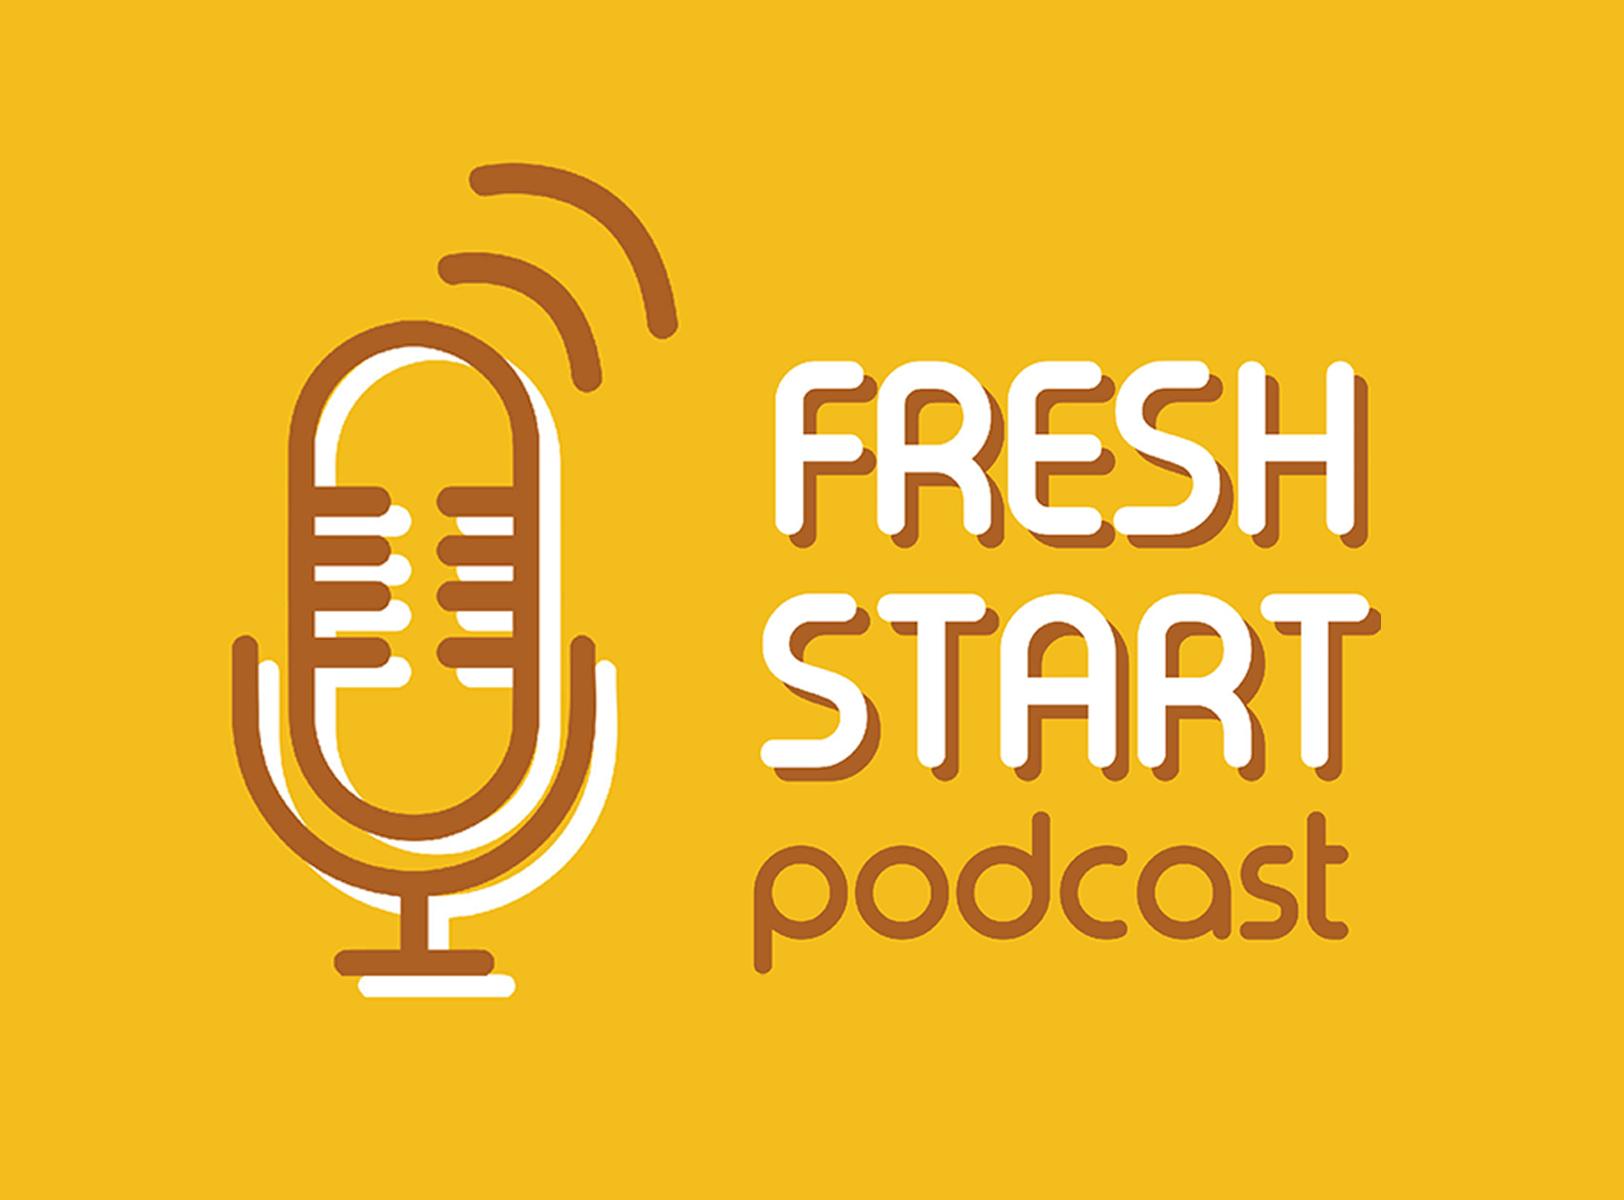 Fresh Start: Podcast News (5/9/2019 Thu.)